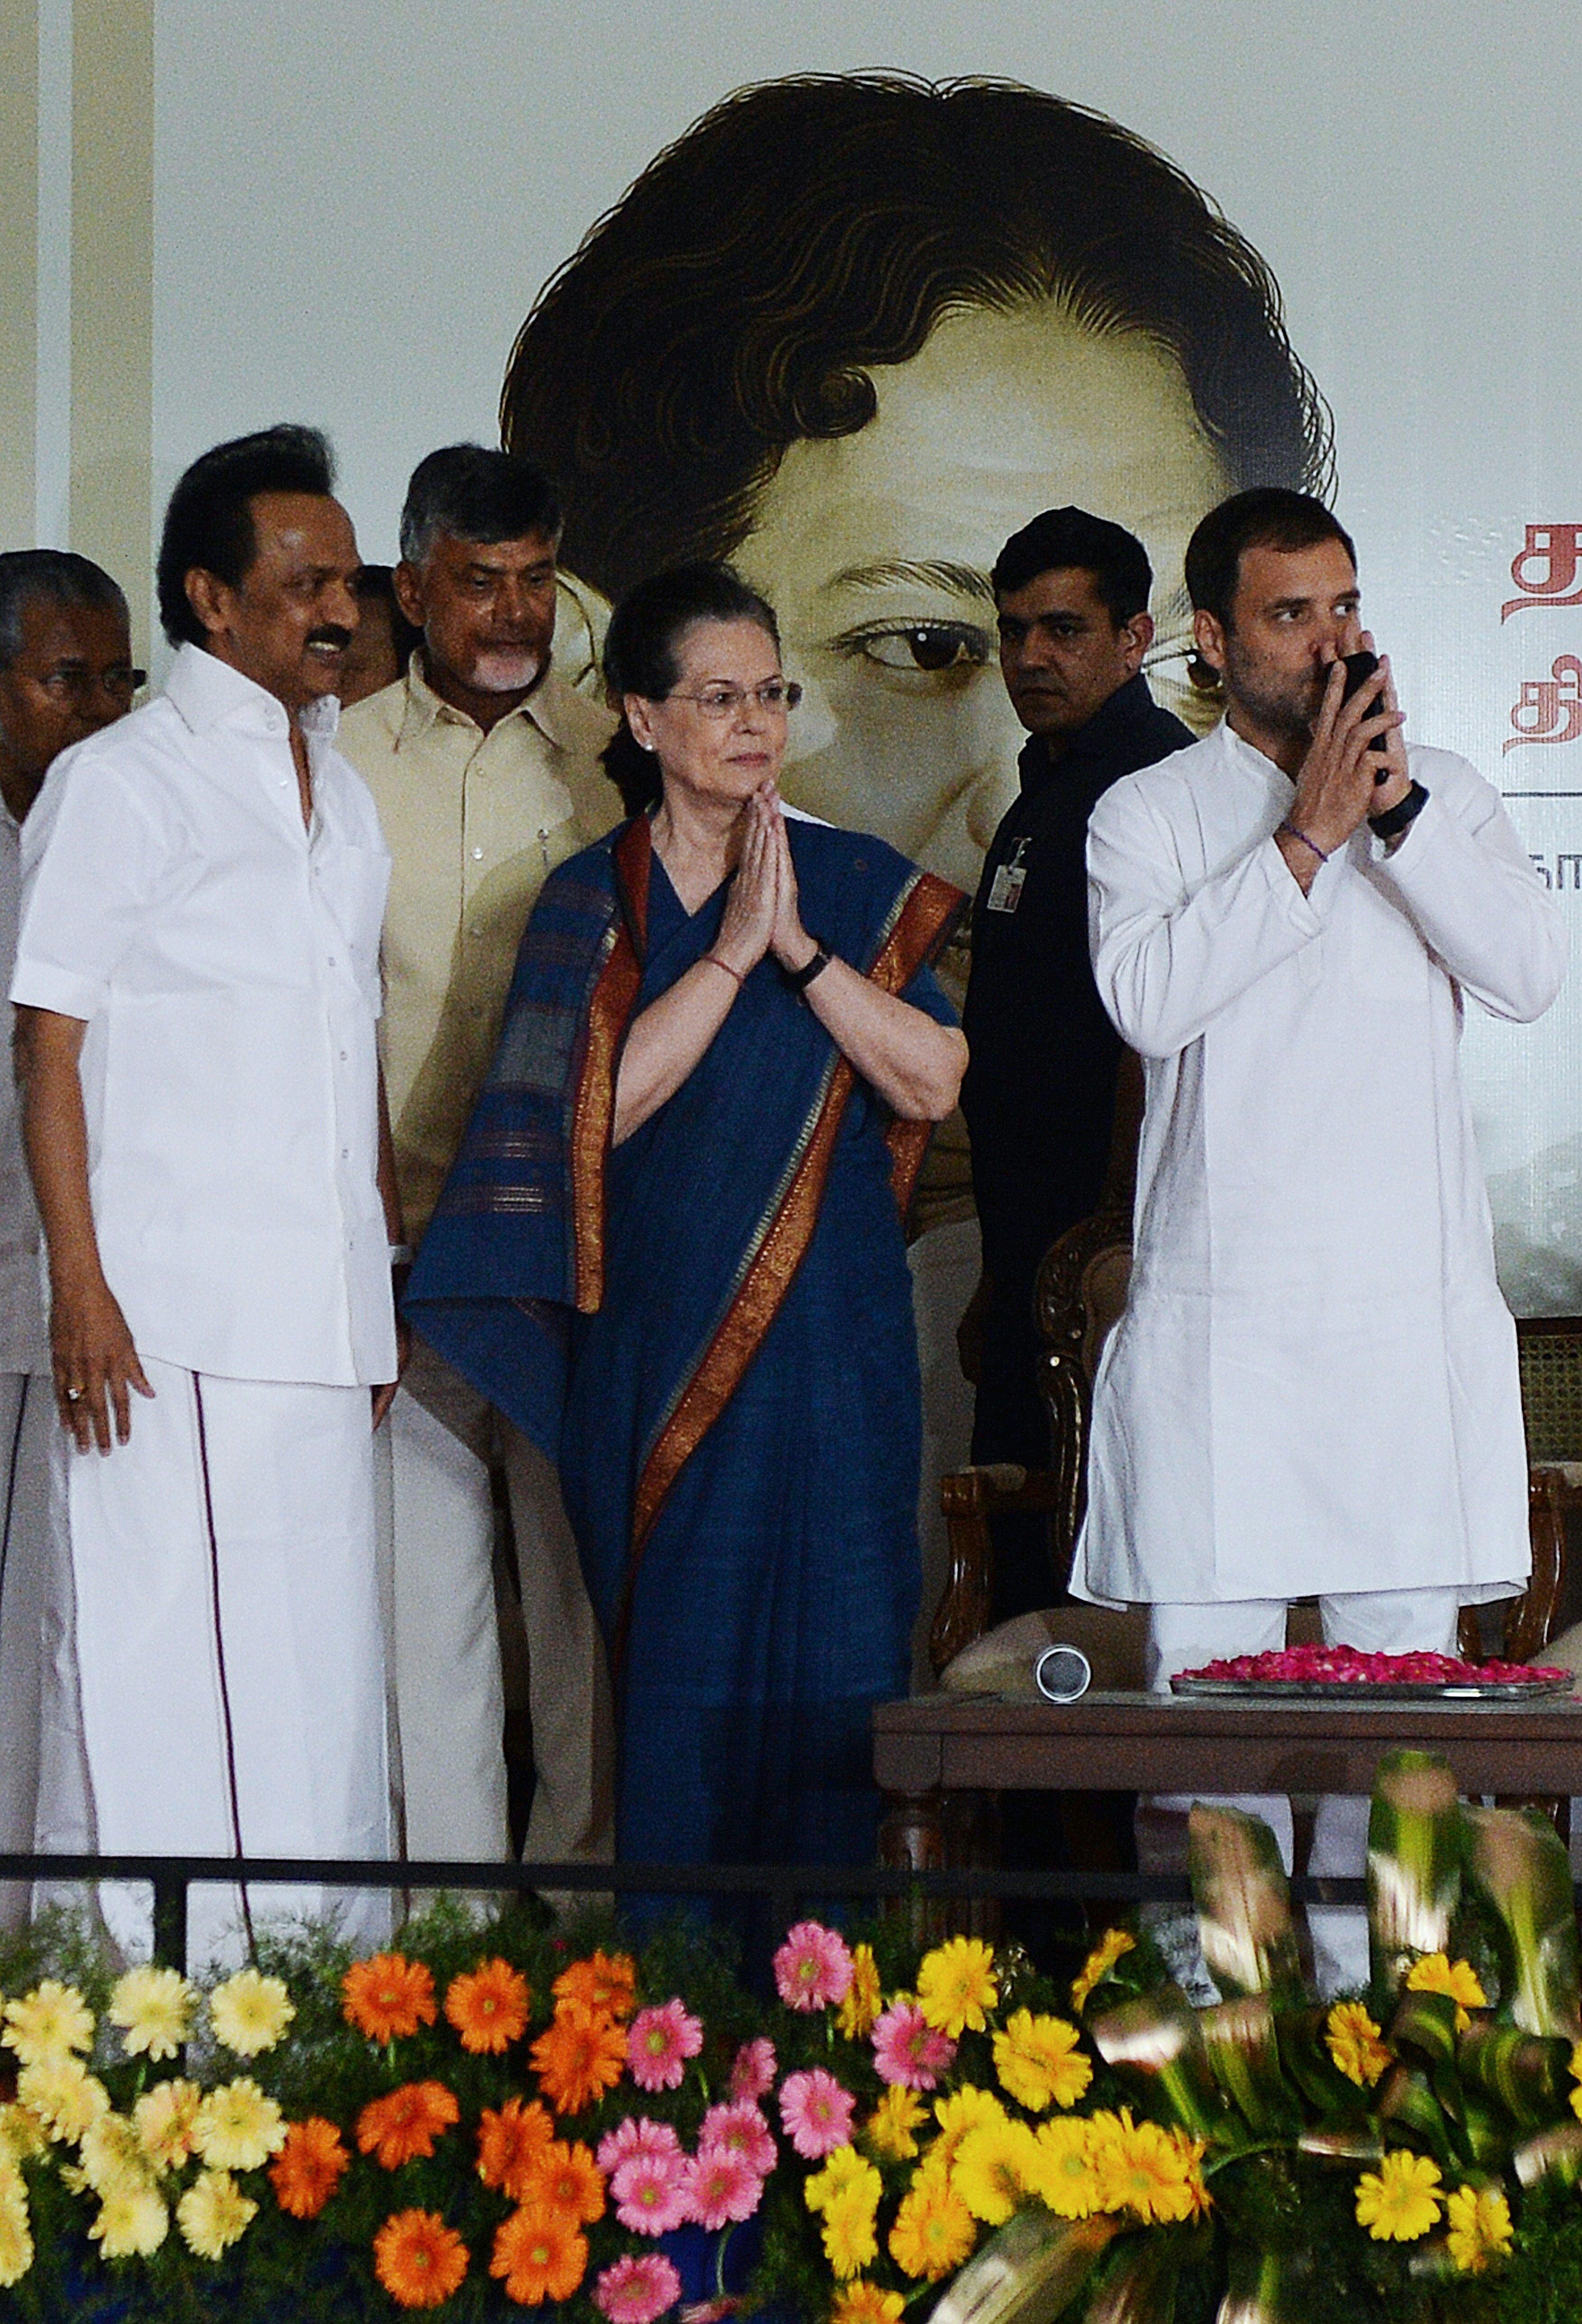 DMK President MK Stalin (left) with Sonia Gandhi and Congress President Rahul Gandhi on